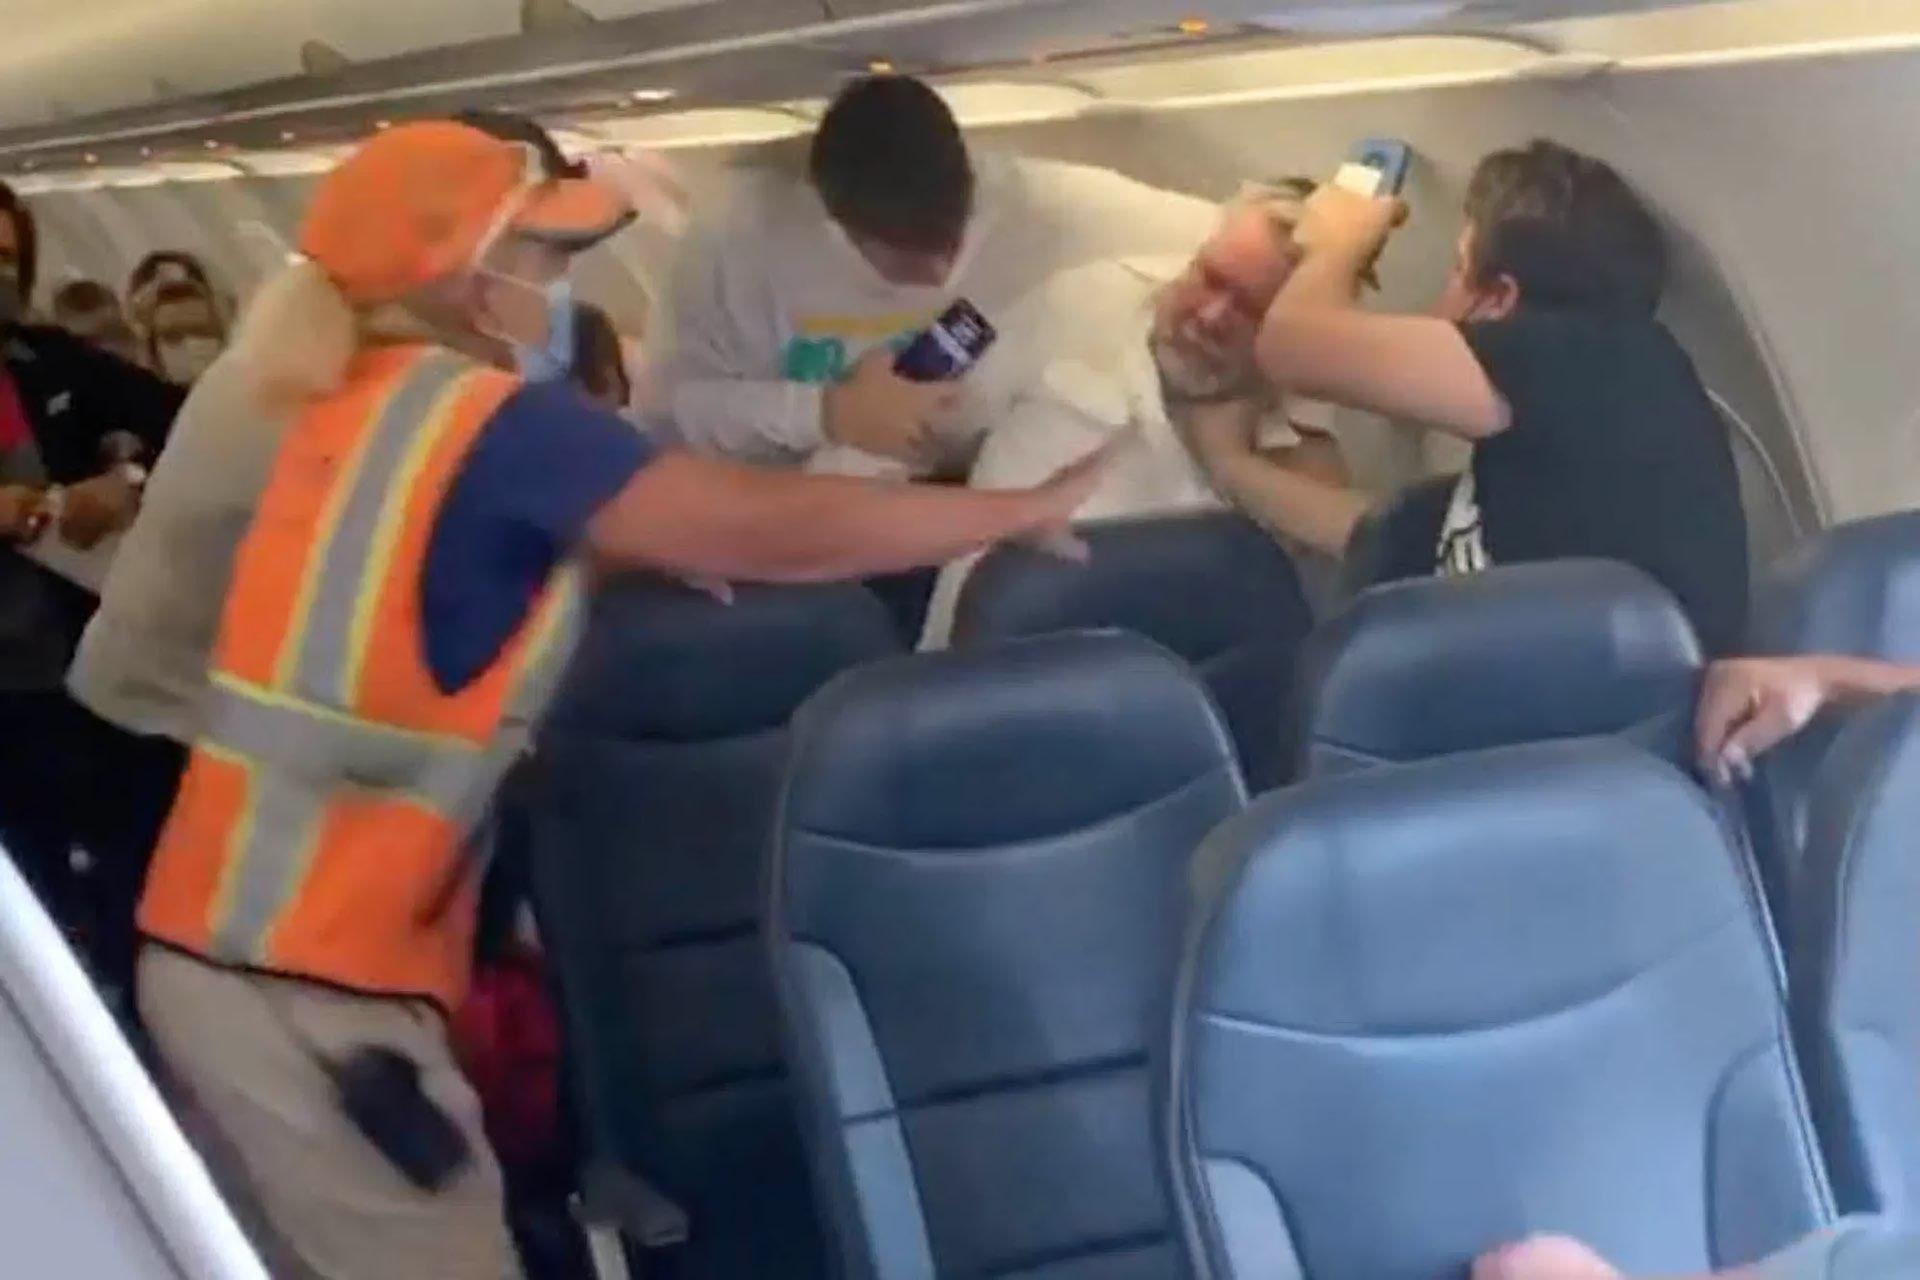 Air Rage passenger